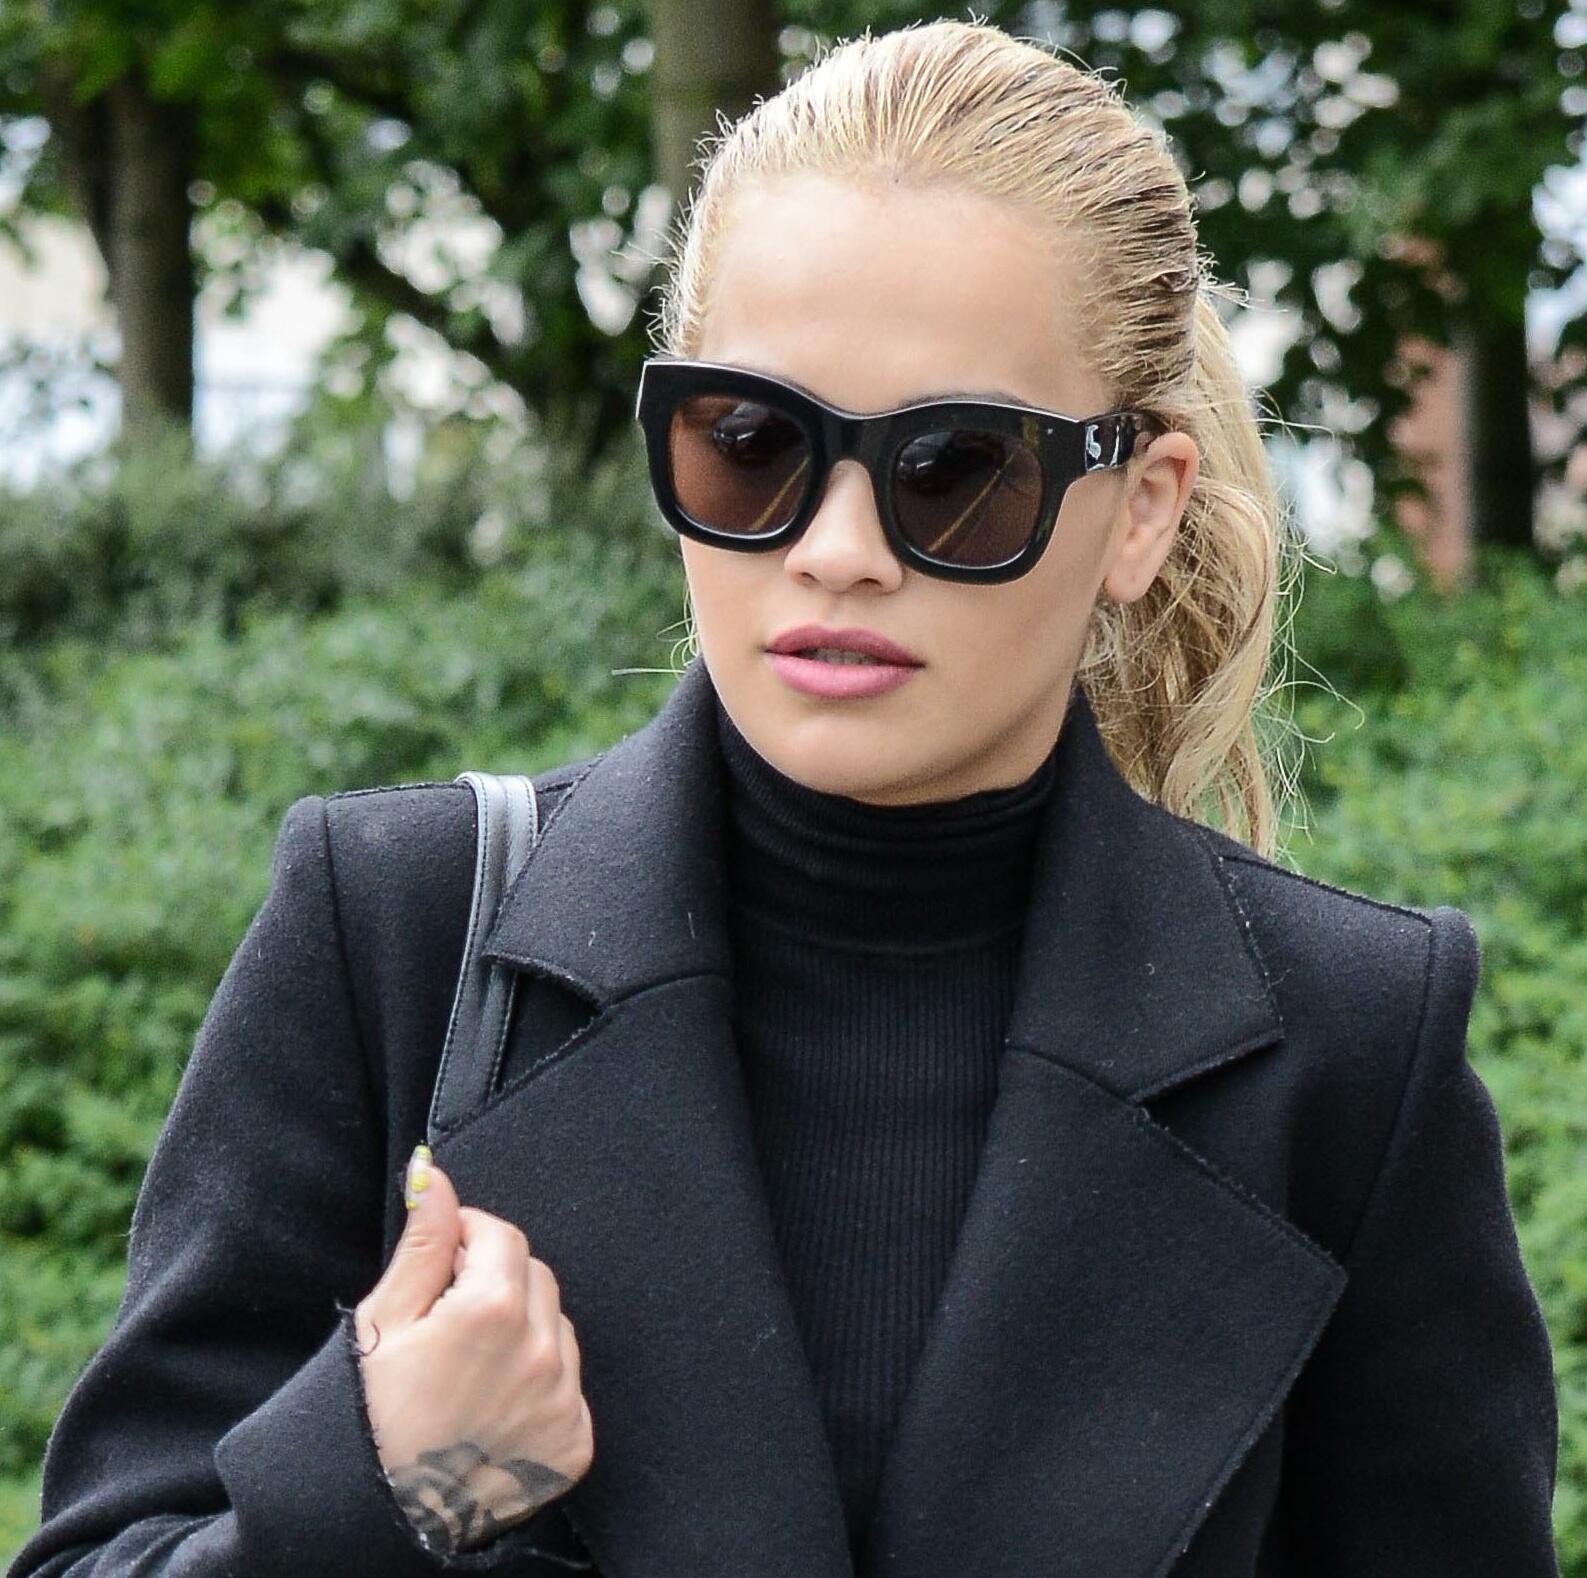 Rita Ora burglar facing jail